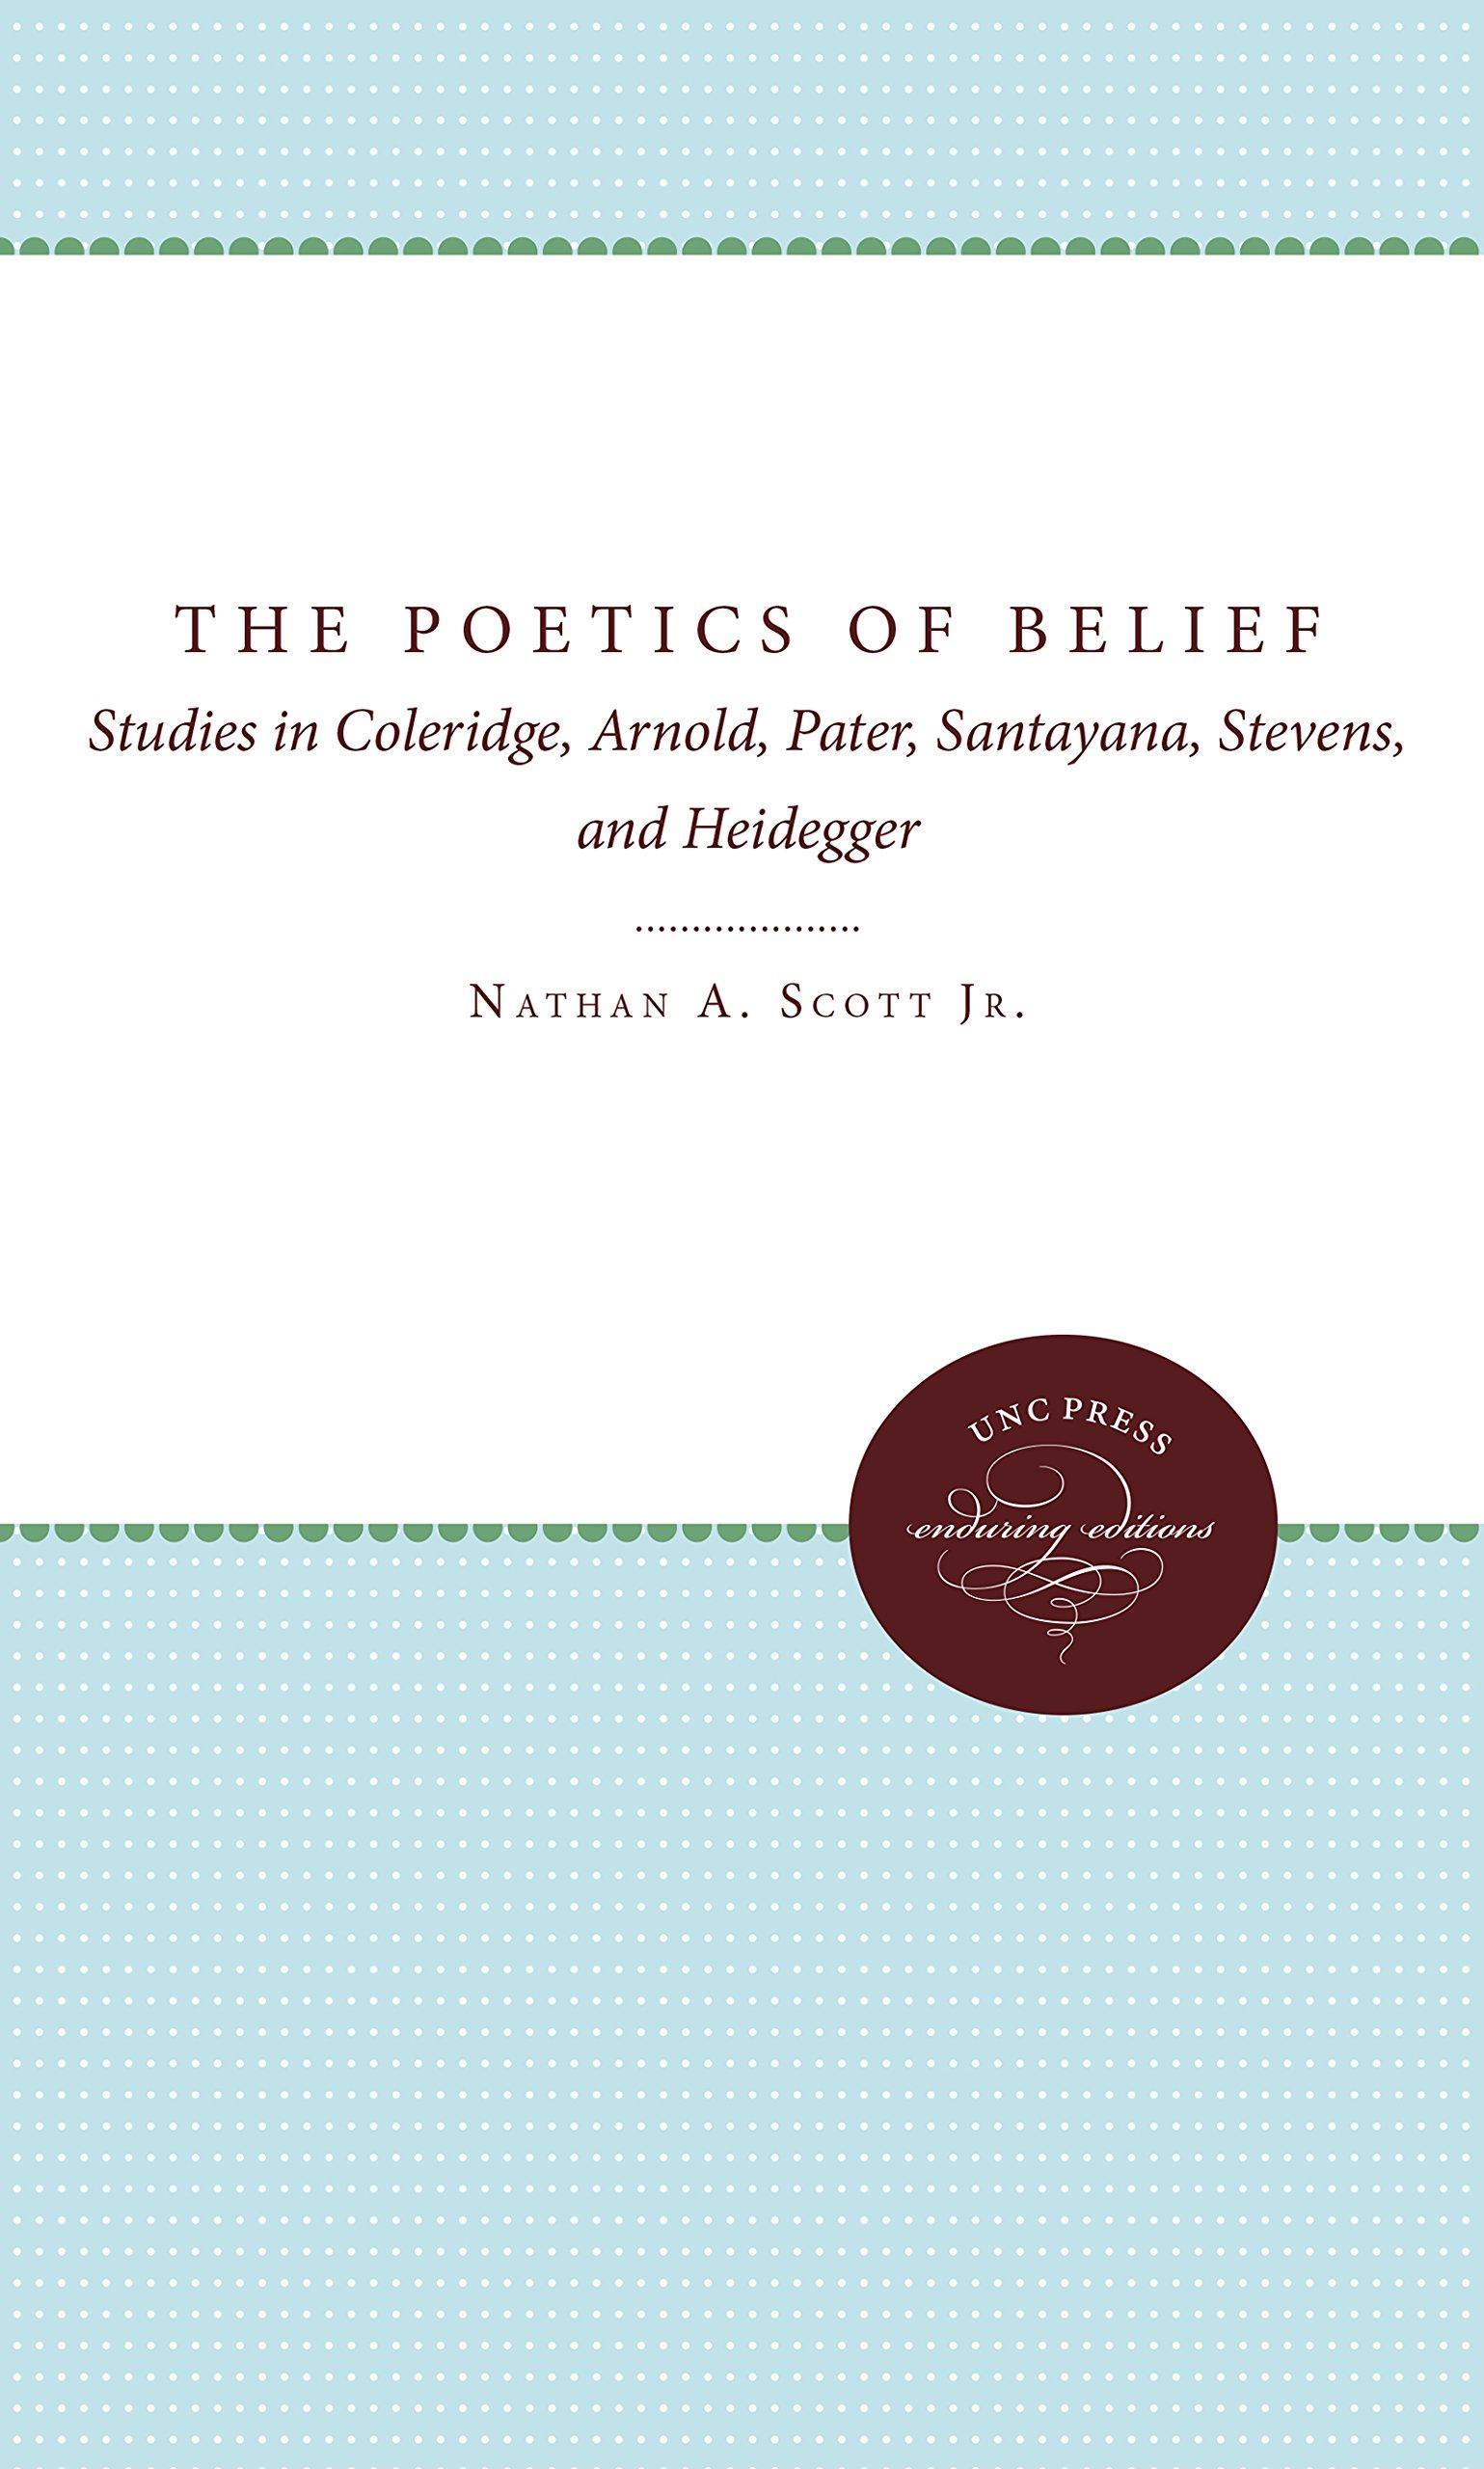 Download The Poetics of Belief: Studies in Coleridge, Arnold, Pater, Santayana, Stevens, and Heidegger (Studies in Religion) pdf